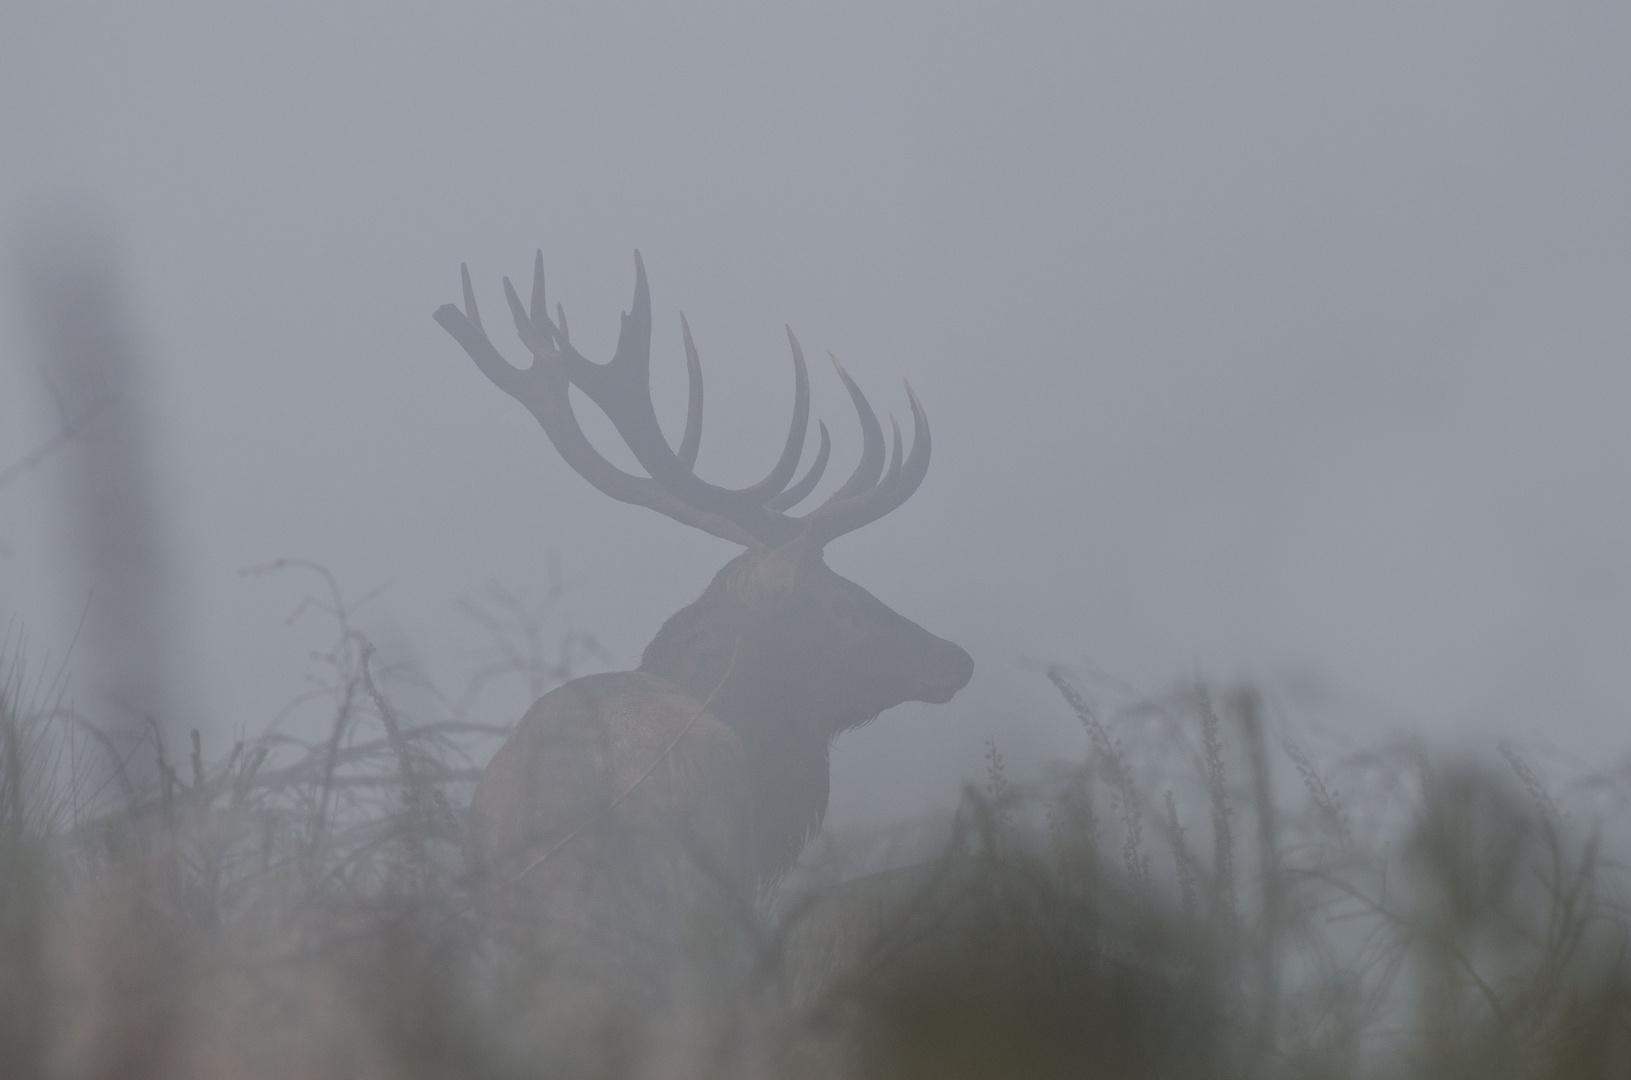 Nebelhirsch zur Brunftzeit